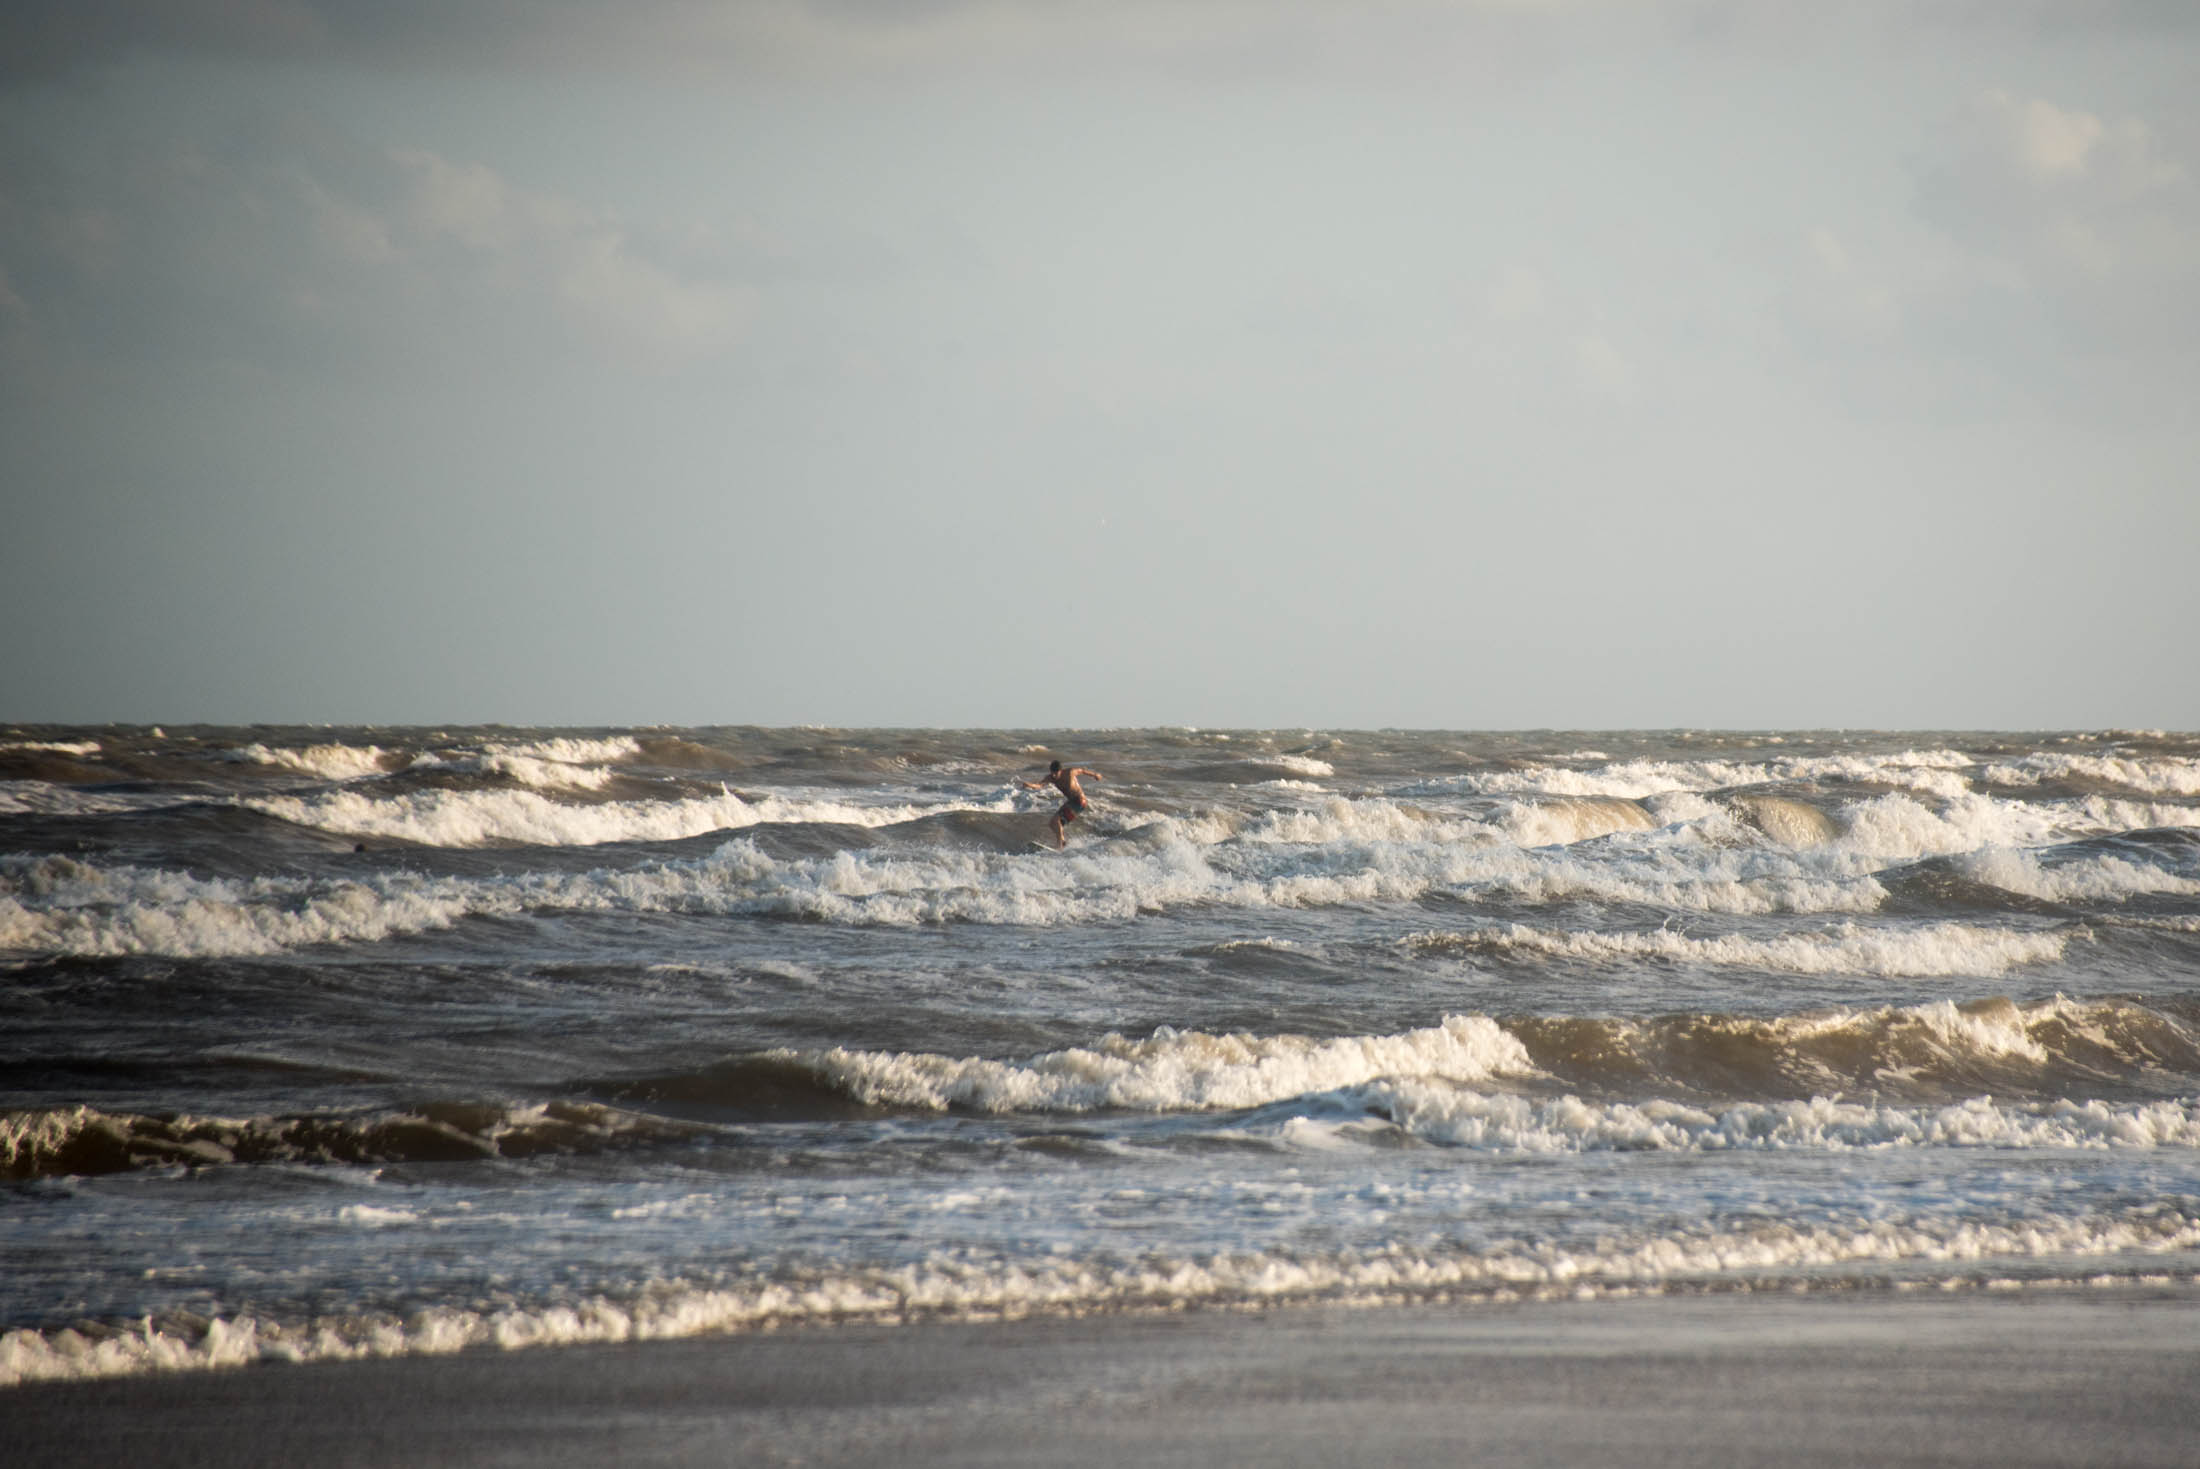 matagorda-beach-july-fourth-11